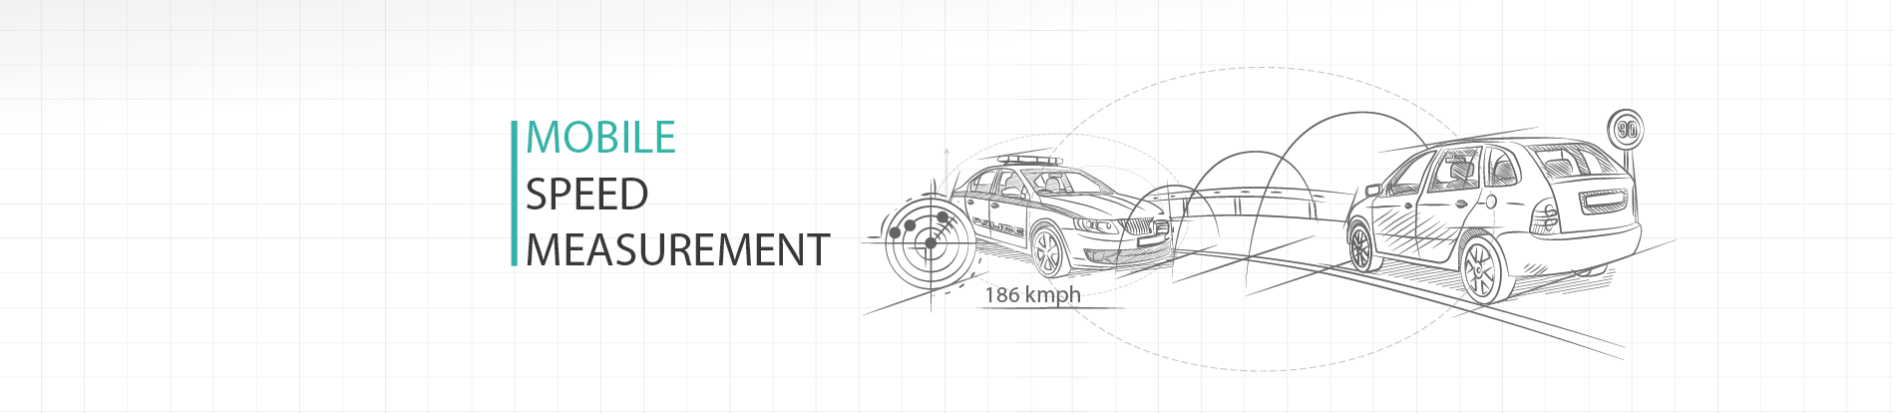 mobile speed measurement1